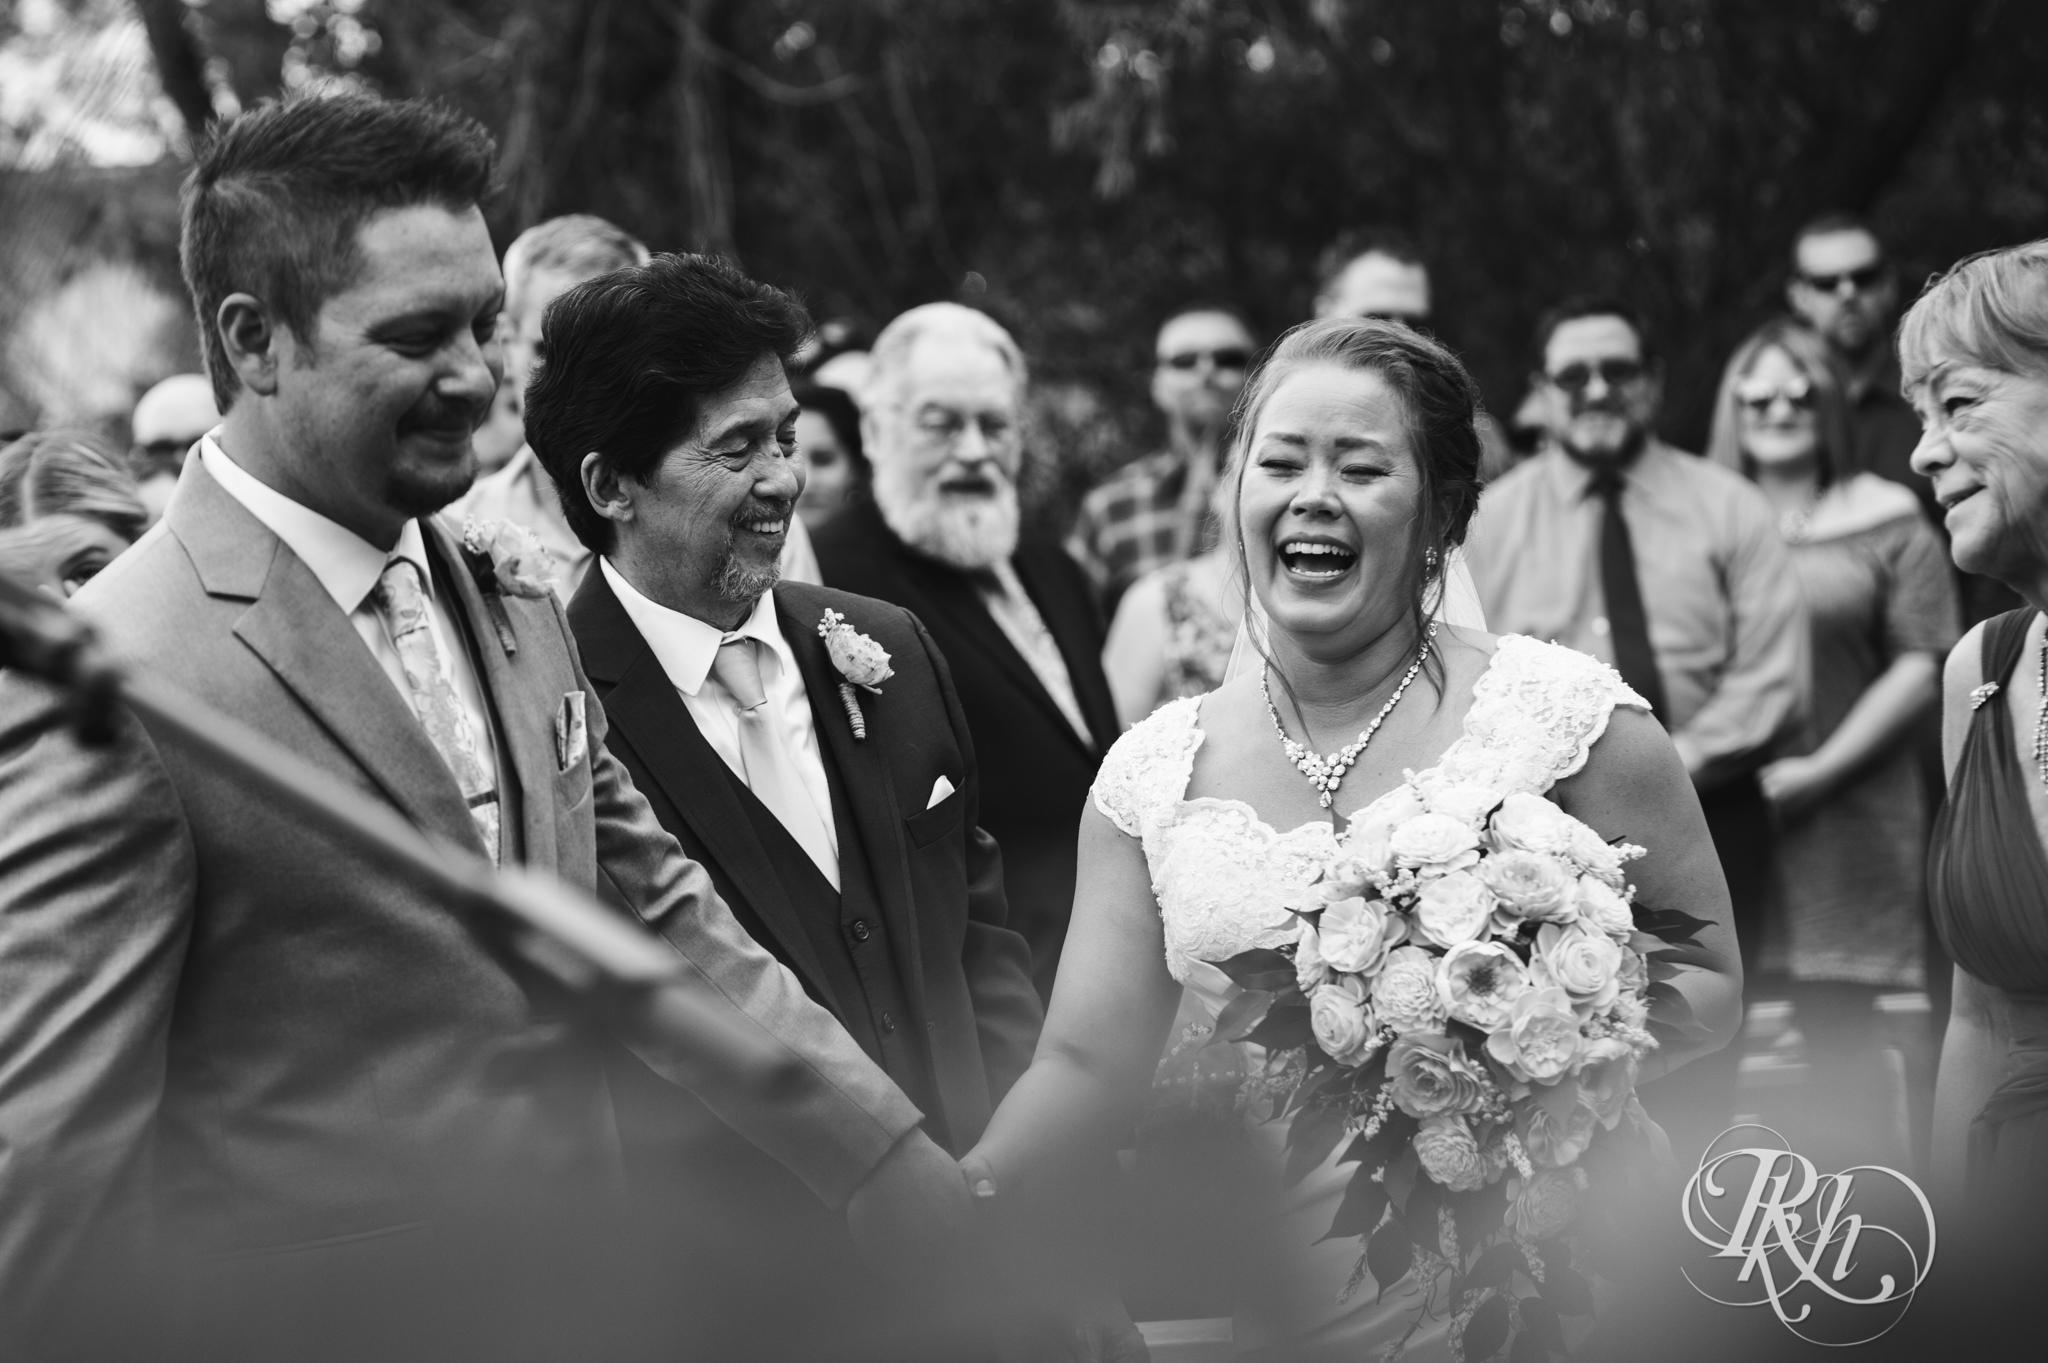 Ally & Nick - Minnesota Wedding Photography - Next Chapter Winery - RKH Images - Blog (18 of 57).jpg